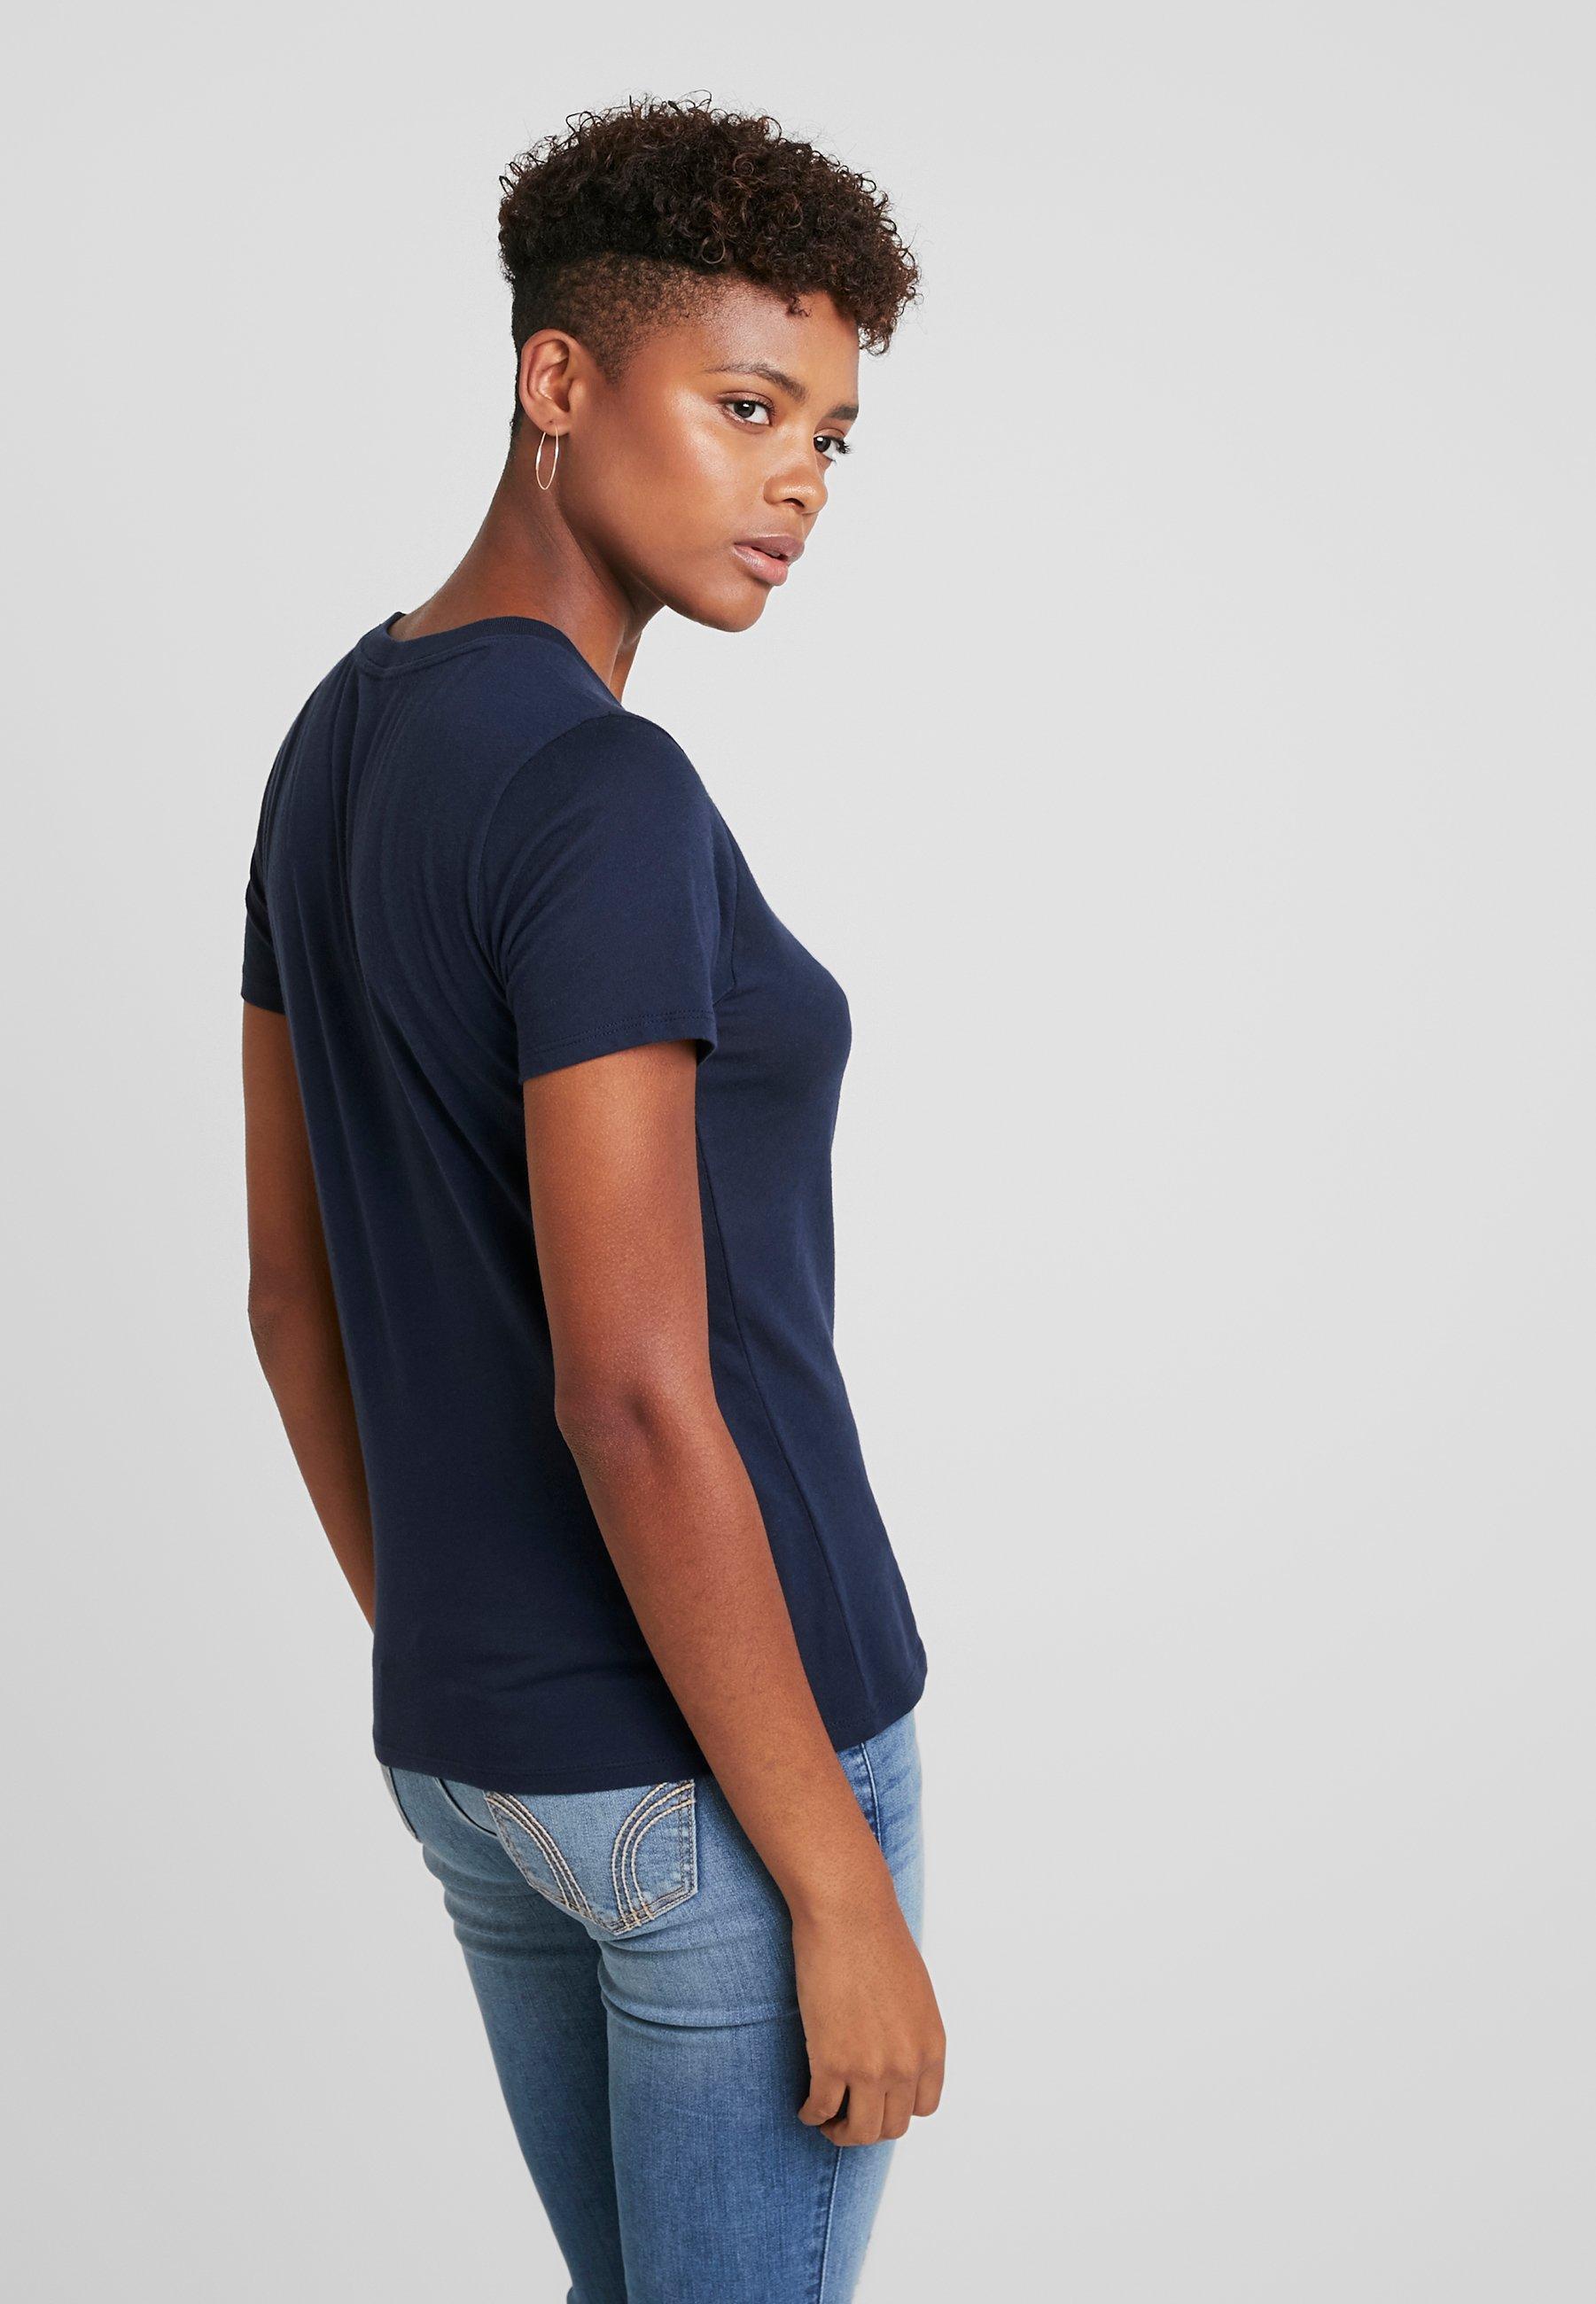 TeeT Hollister Logo CoCore shirt Navy Imprimé kZiTOPXu